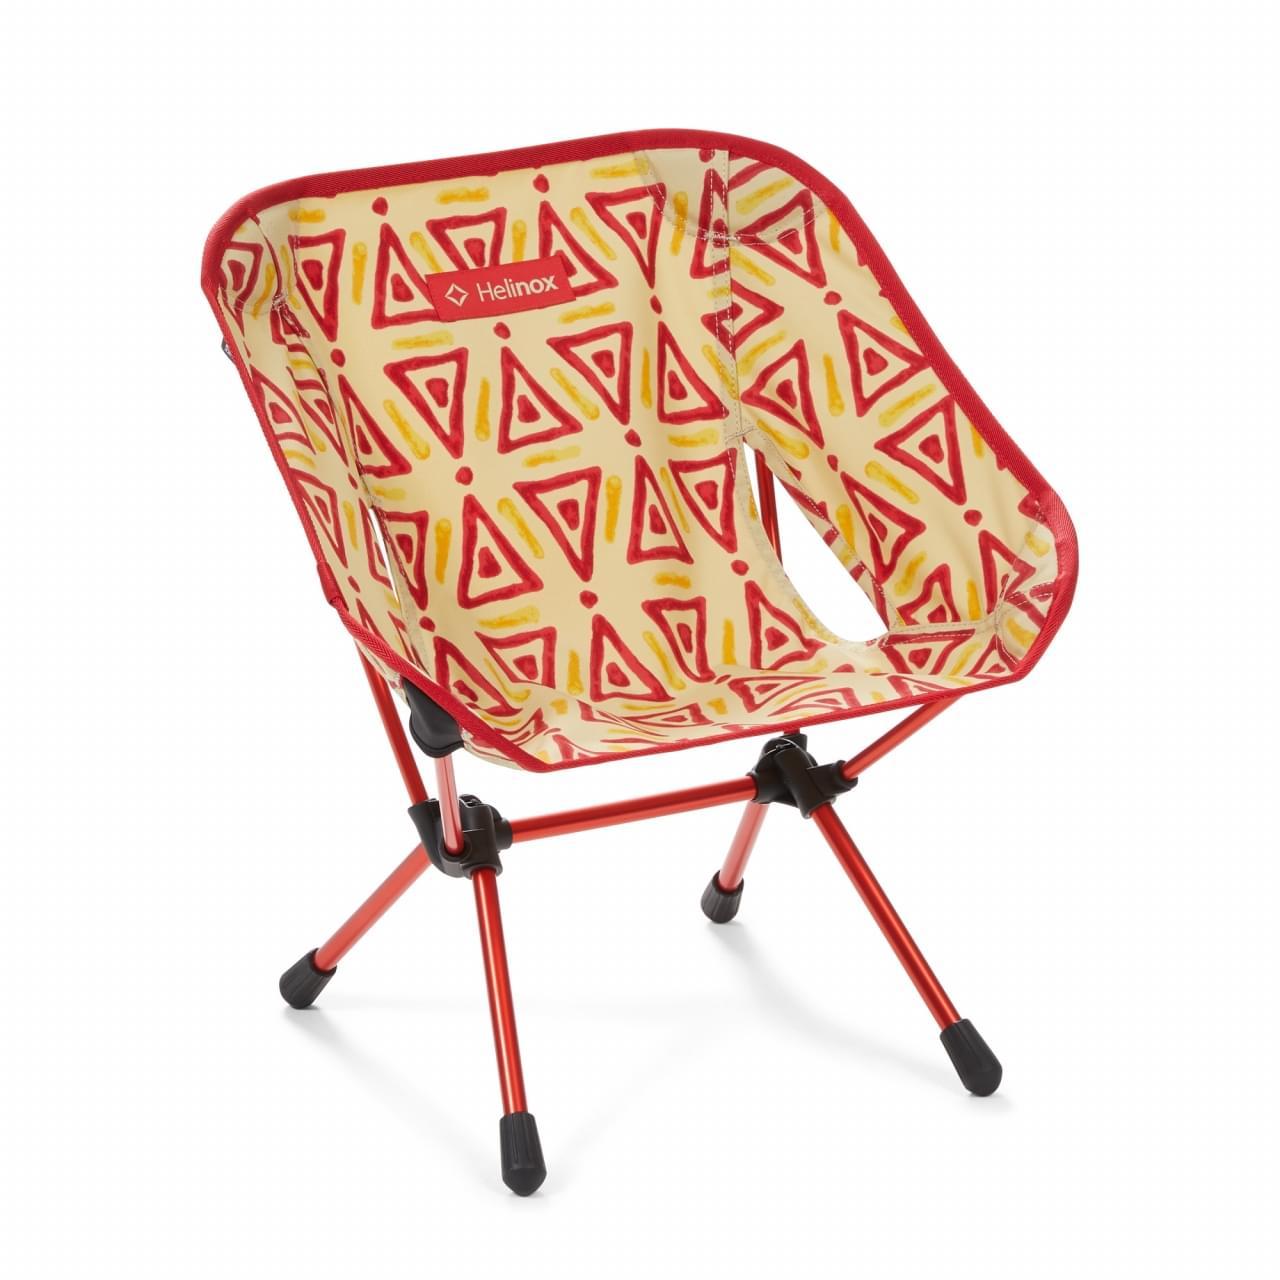 Helinox Chair One Mini Triangle Lichtgewicht Stoel - Rood